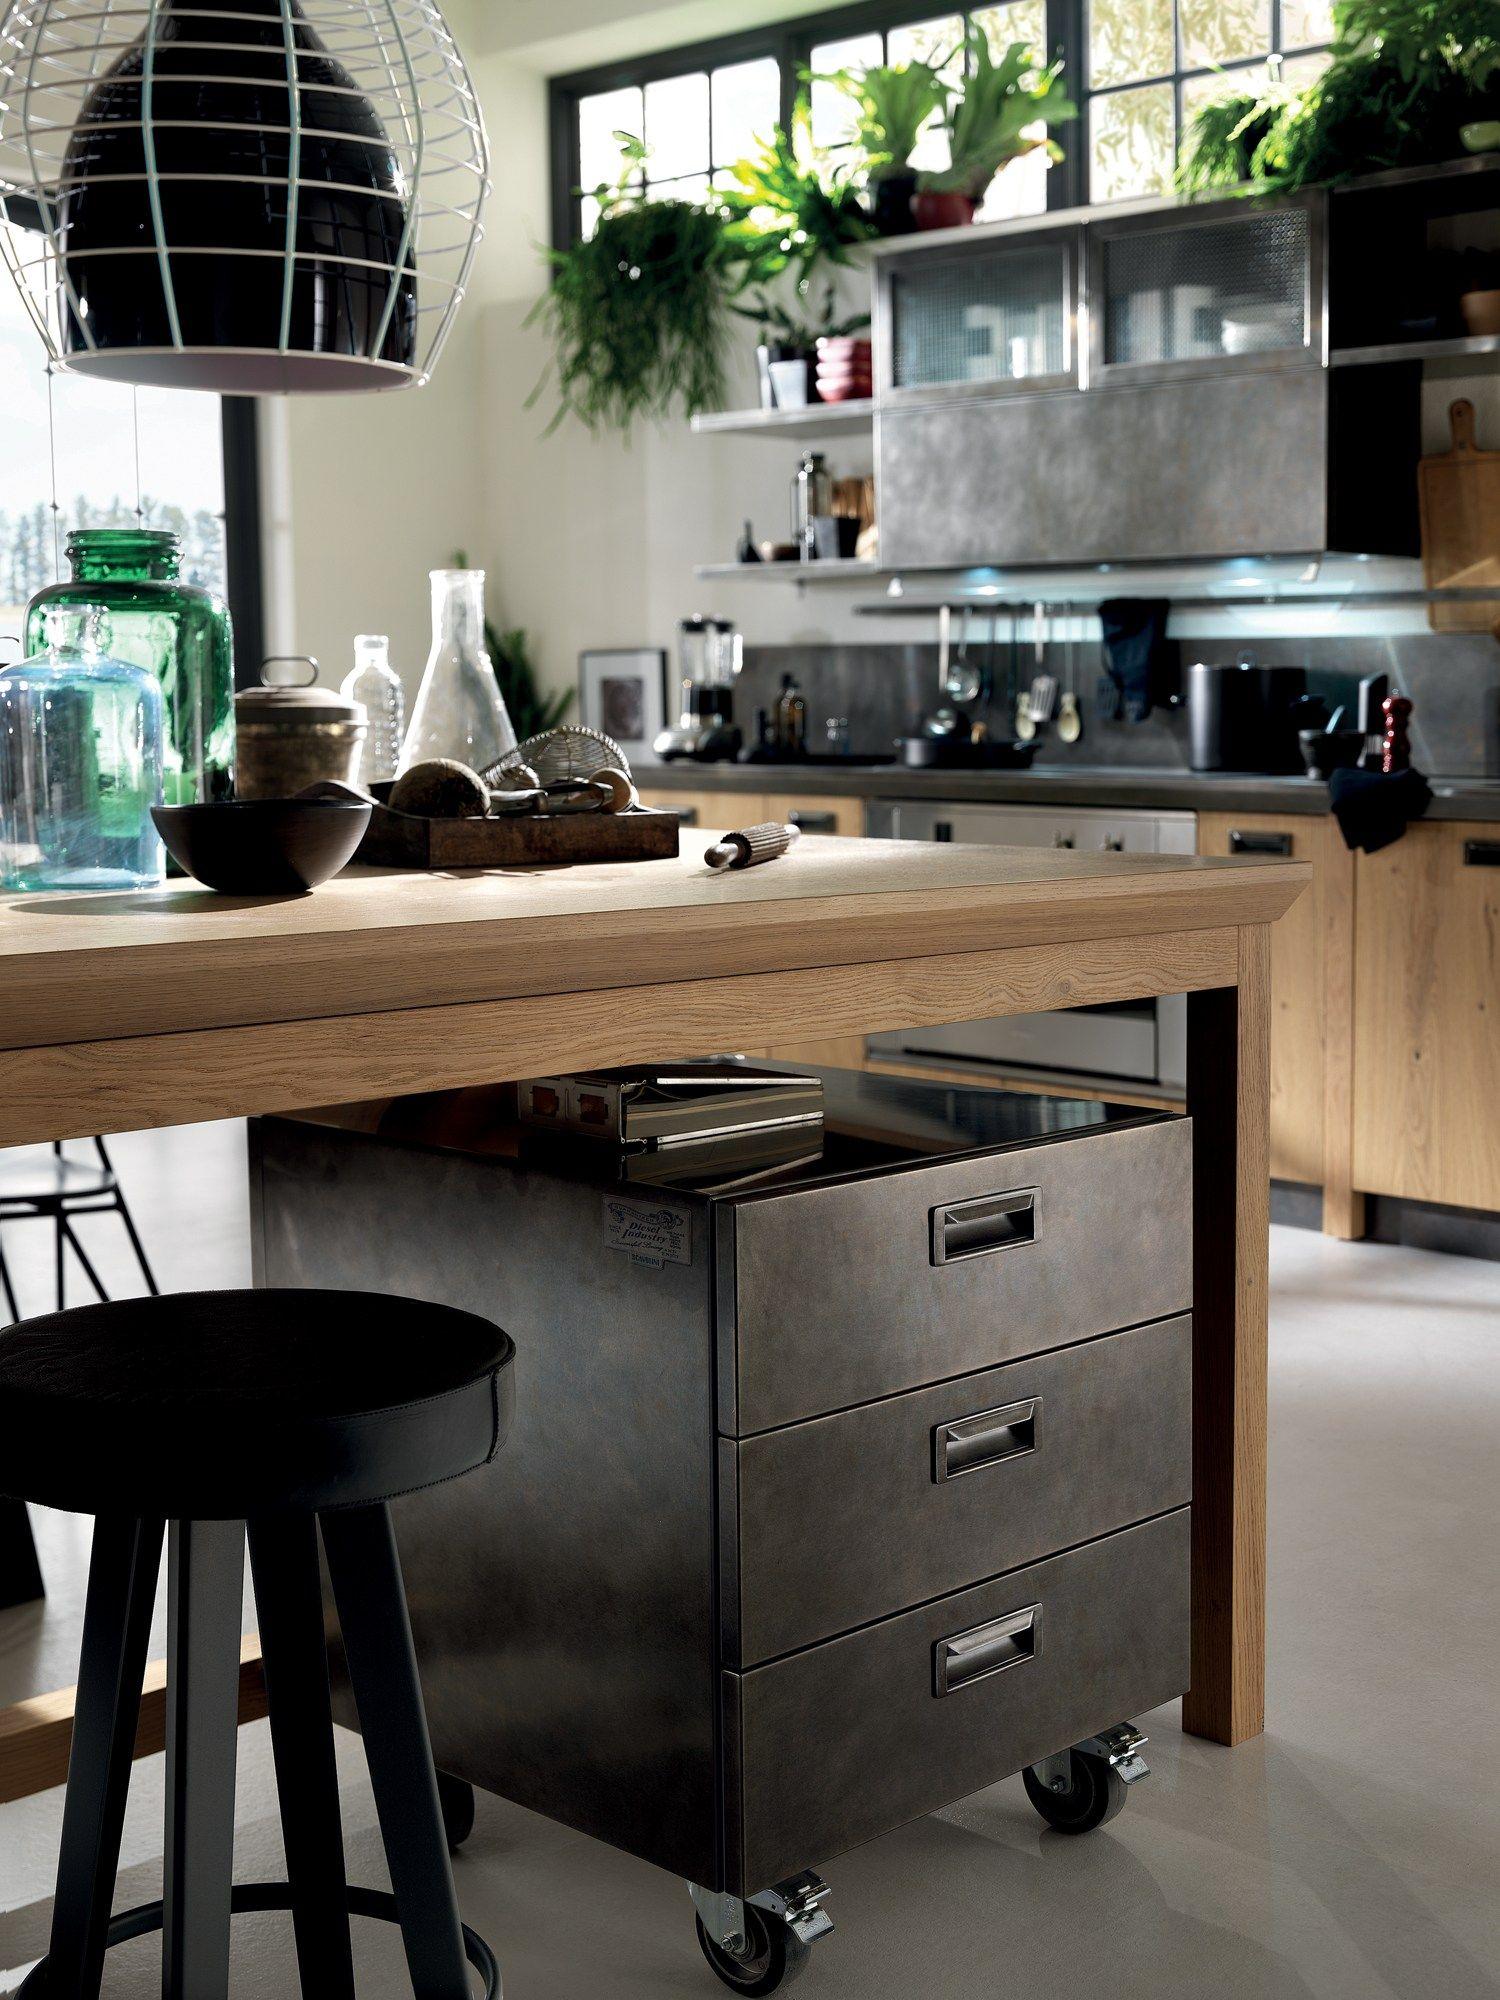 Cucina componibile diesel social kitchen linea scavolini - Cucina diesel scavolini ...